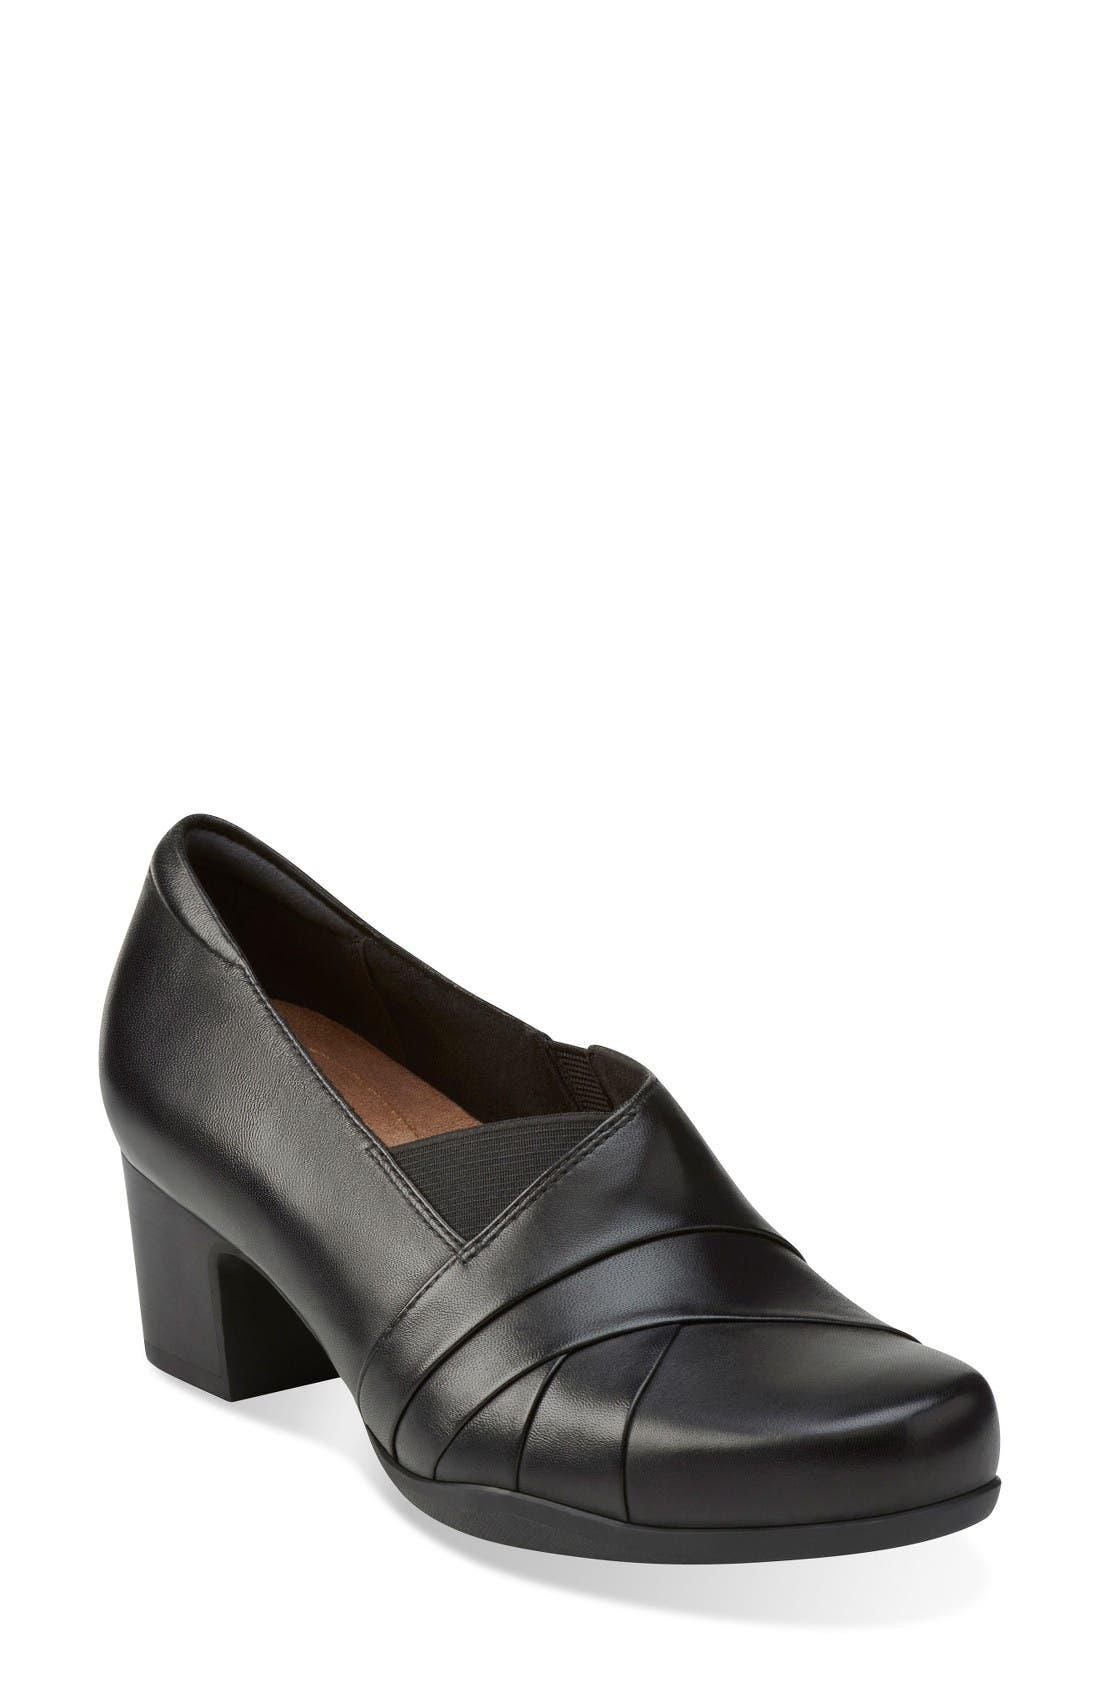 'Rosalyn Adele' Block Heel Pump,                             Main thumbnail 1, color,                             Black Leather